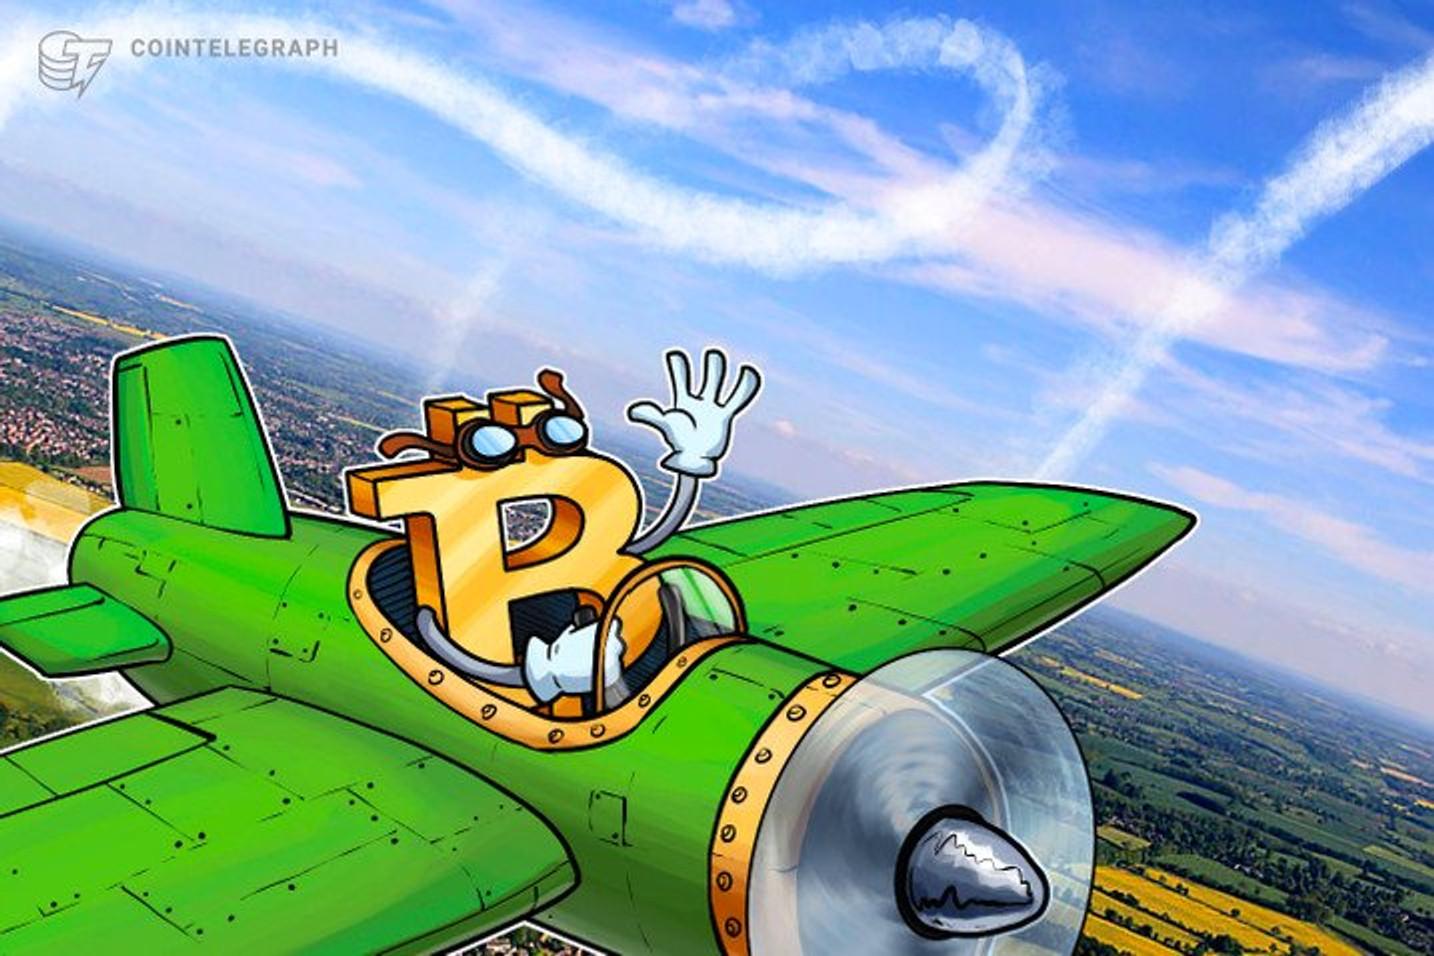 Bitcoin luta para romper a barreira dos US$ 8 mil; traders ainda evitam grandes compras